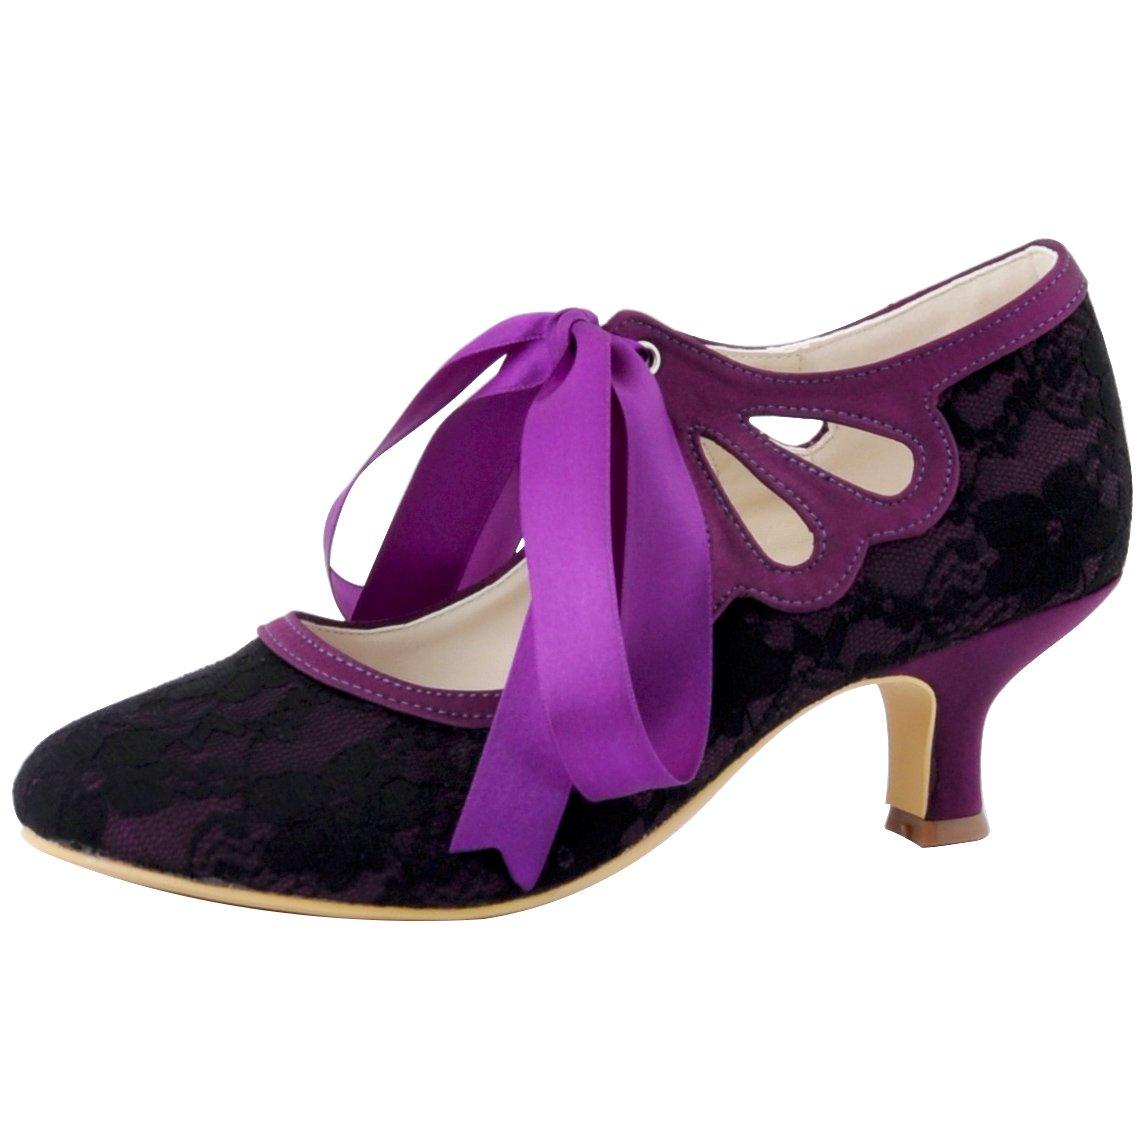 ElegantPark HC1521 Women's Mary Jane Closed Toe Low Heel Pumps Lace Wedding Dress Shoes B011NW79D4 5 B(M) US (true fitting 6 US) Cut-out Black